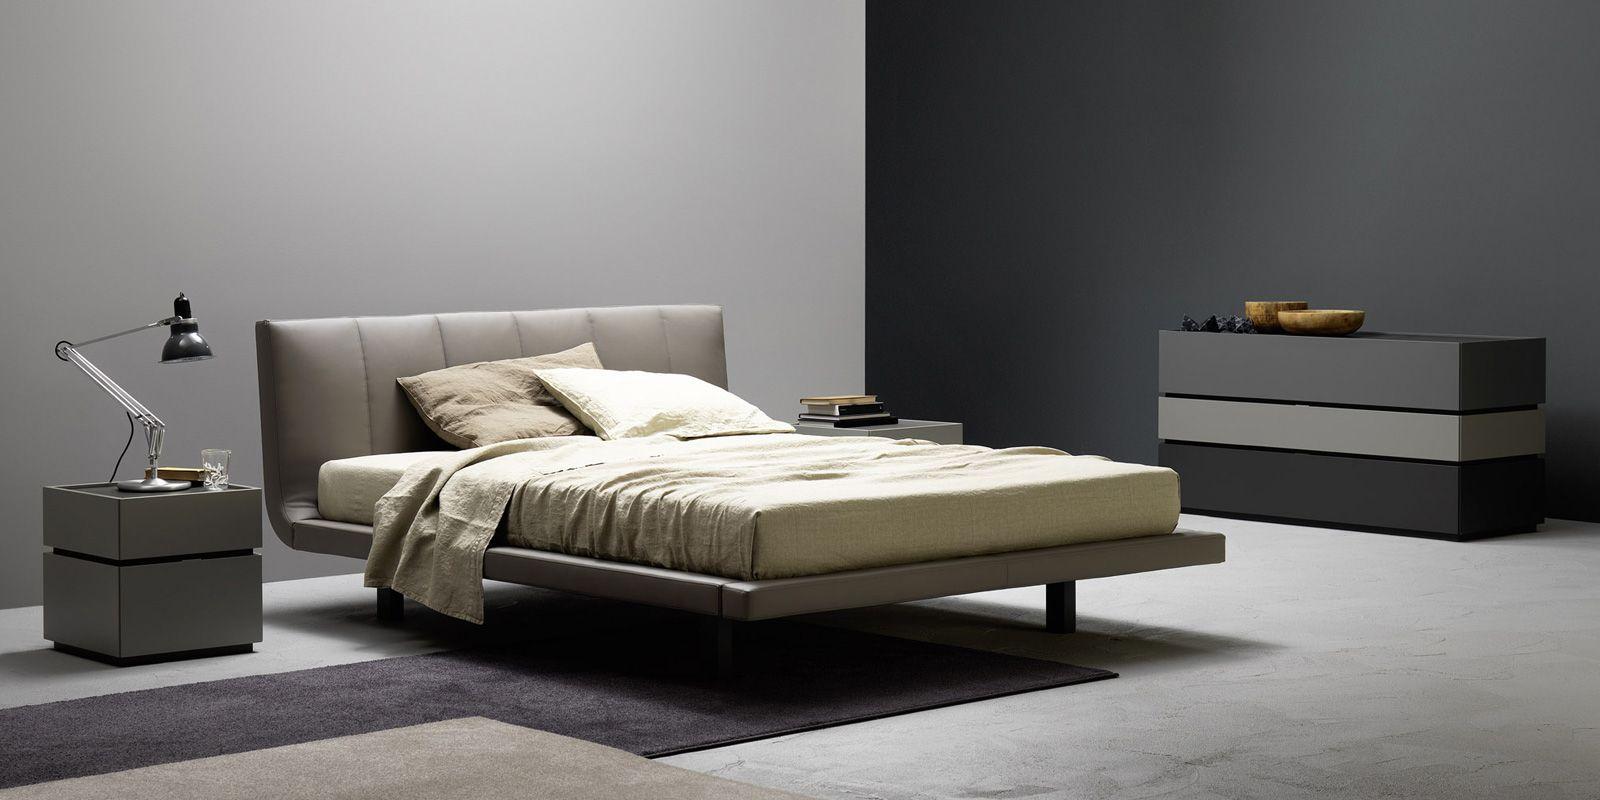 Camere da letto mobilificio san giacomo letto sirio - San giacomo camere da letto ...